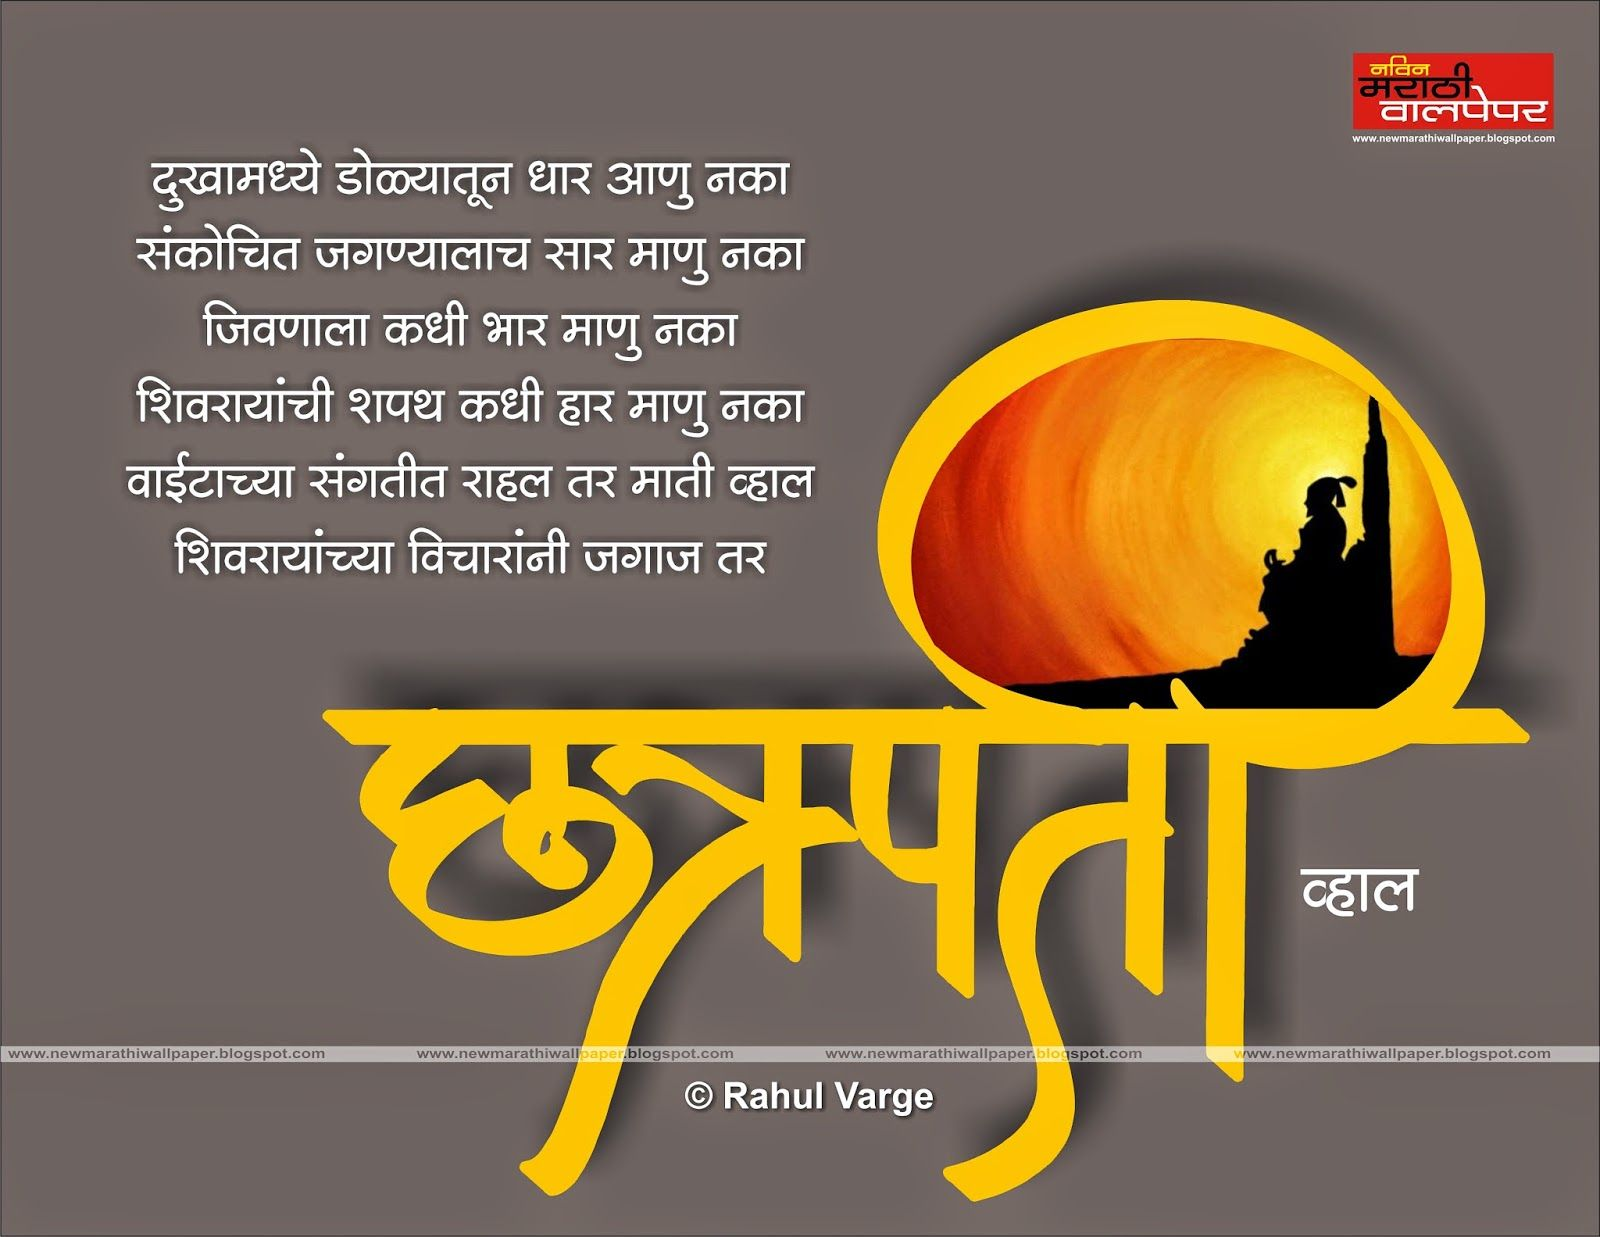 Shivaji Marharaj + Marathi Wallpaper - New Marathi ...